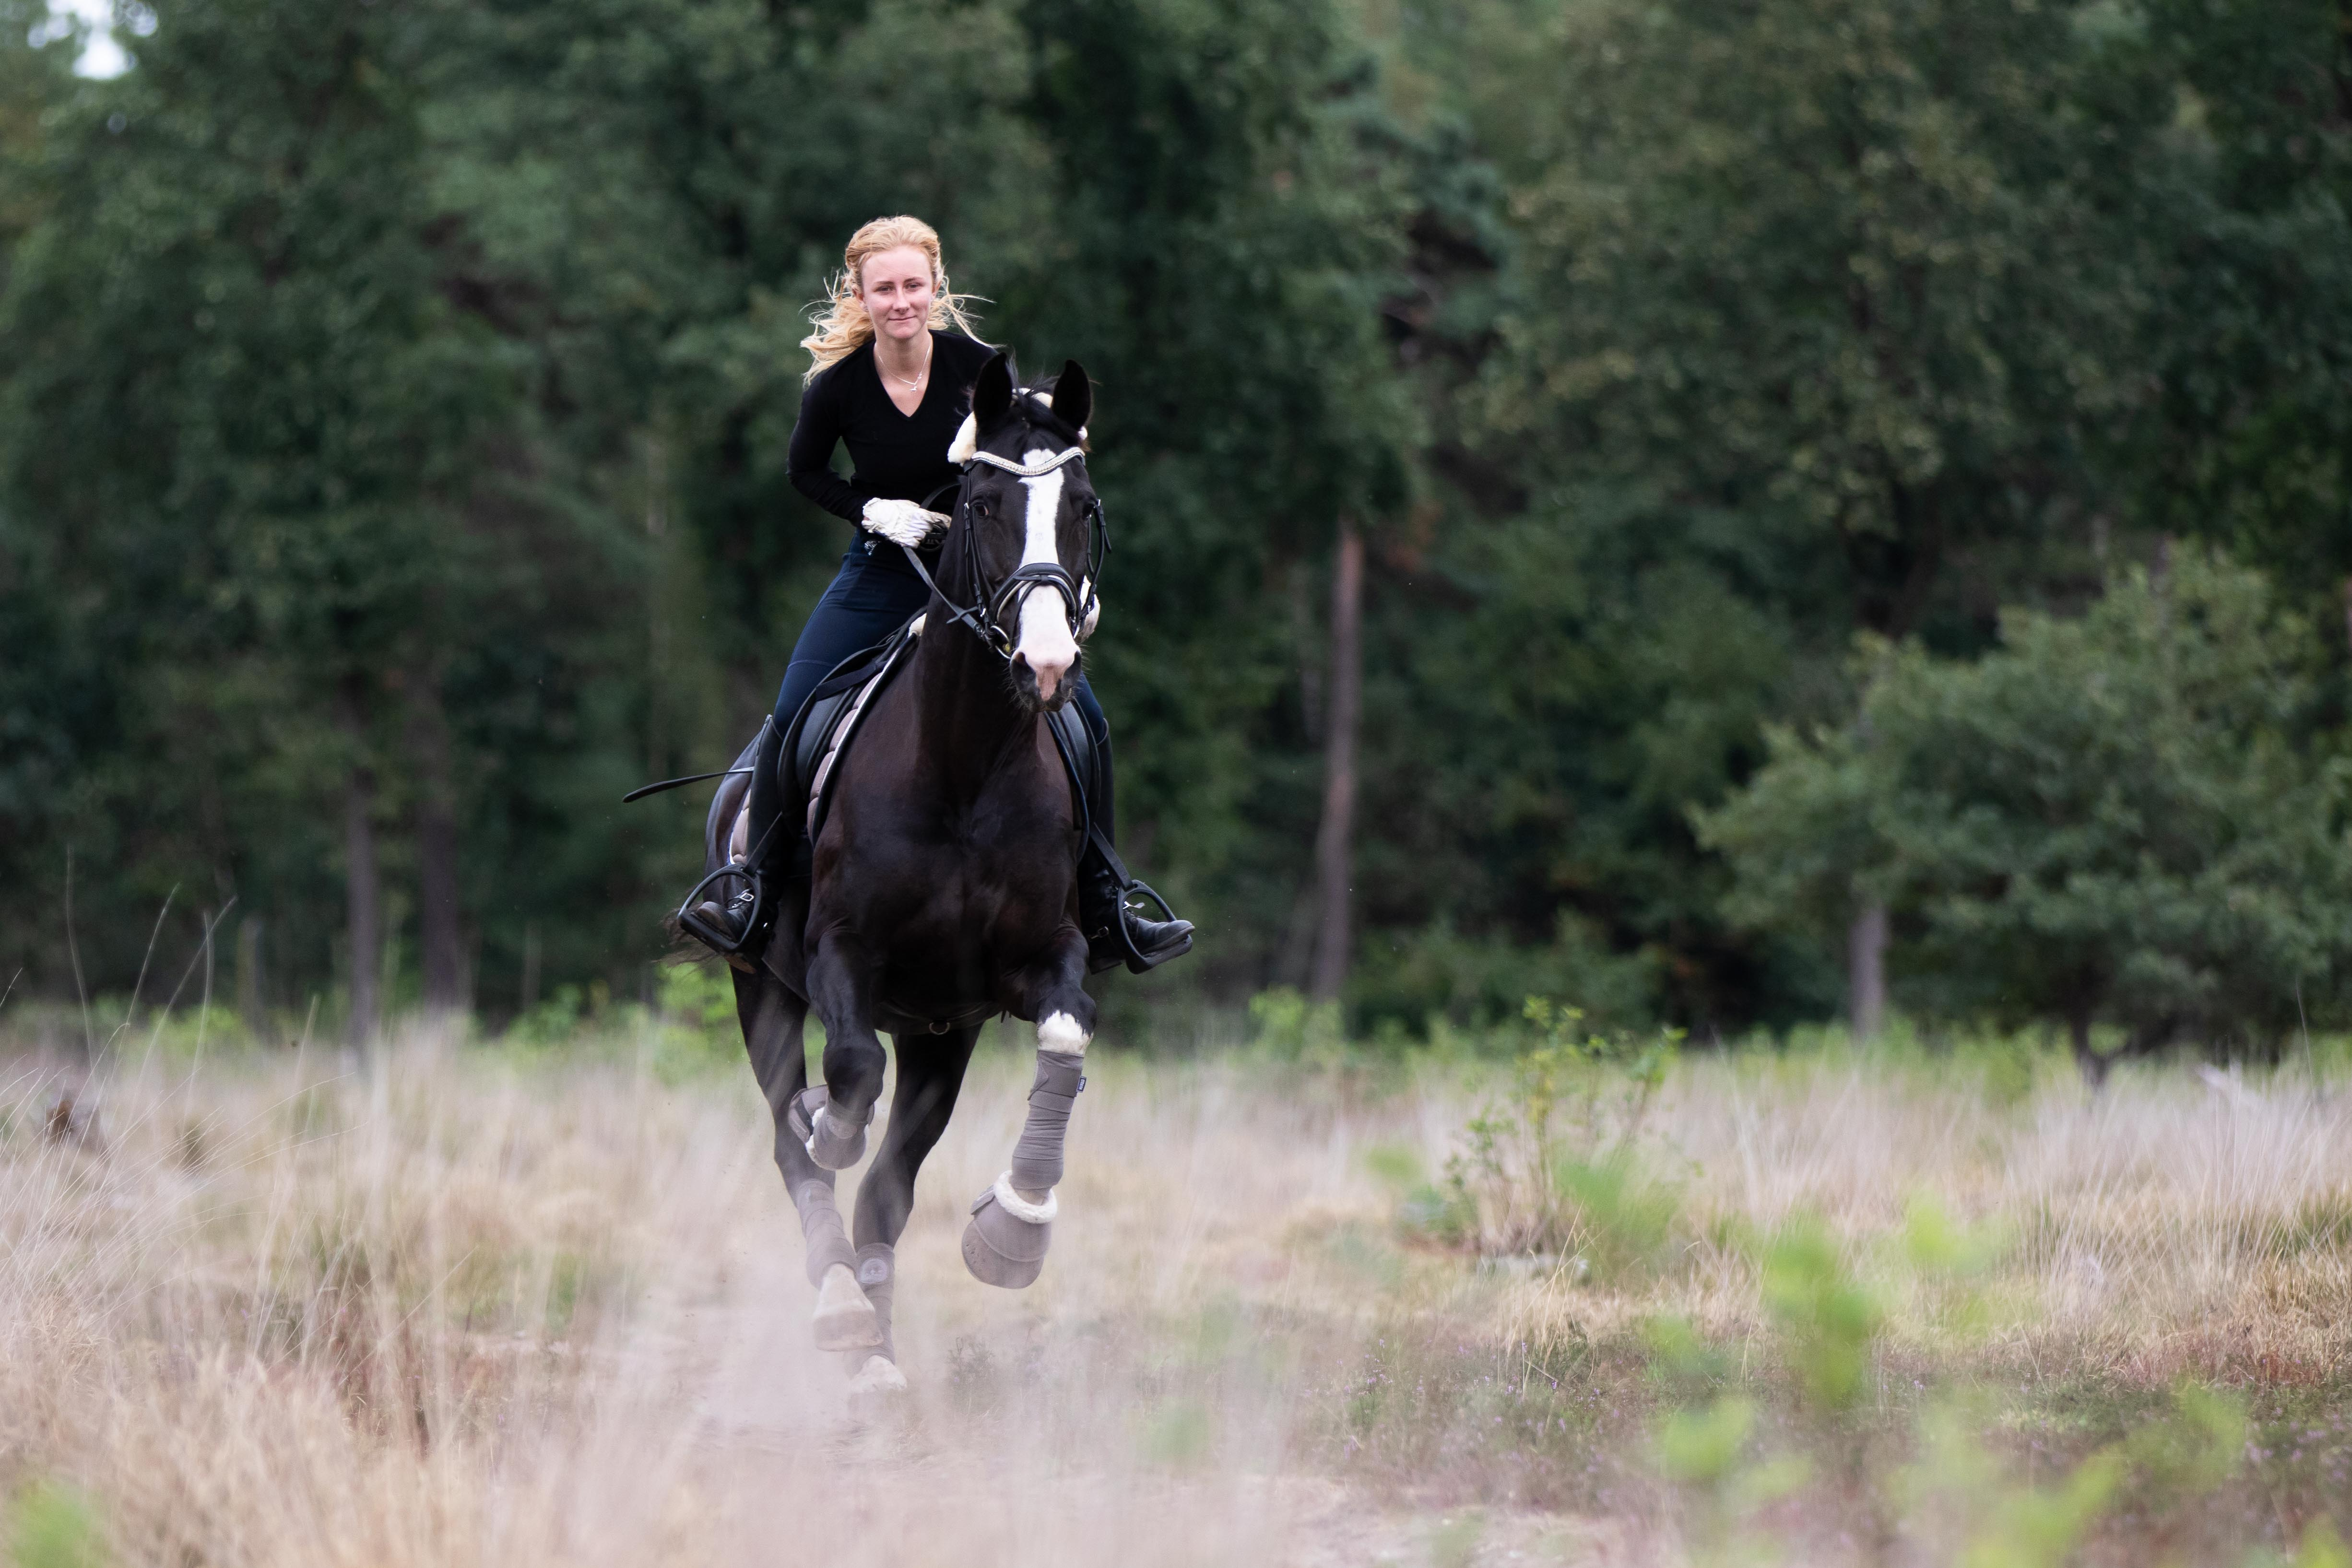 Marleen Verheul Fotografie, dierenfotografie, paardenfotografie, dierenfotograaf, paard en ruiter galopperend in het bos